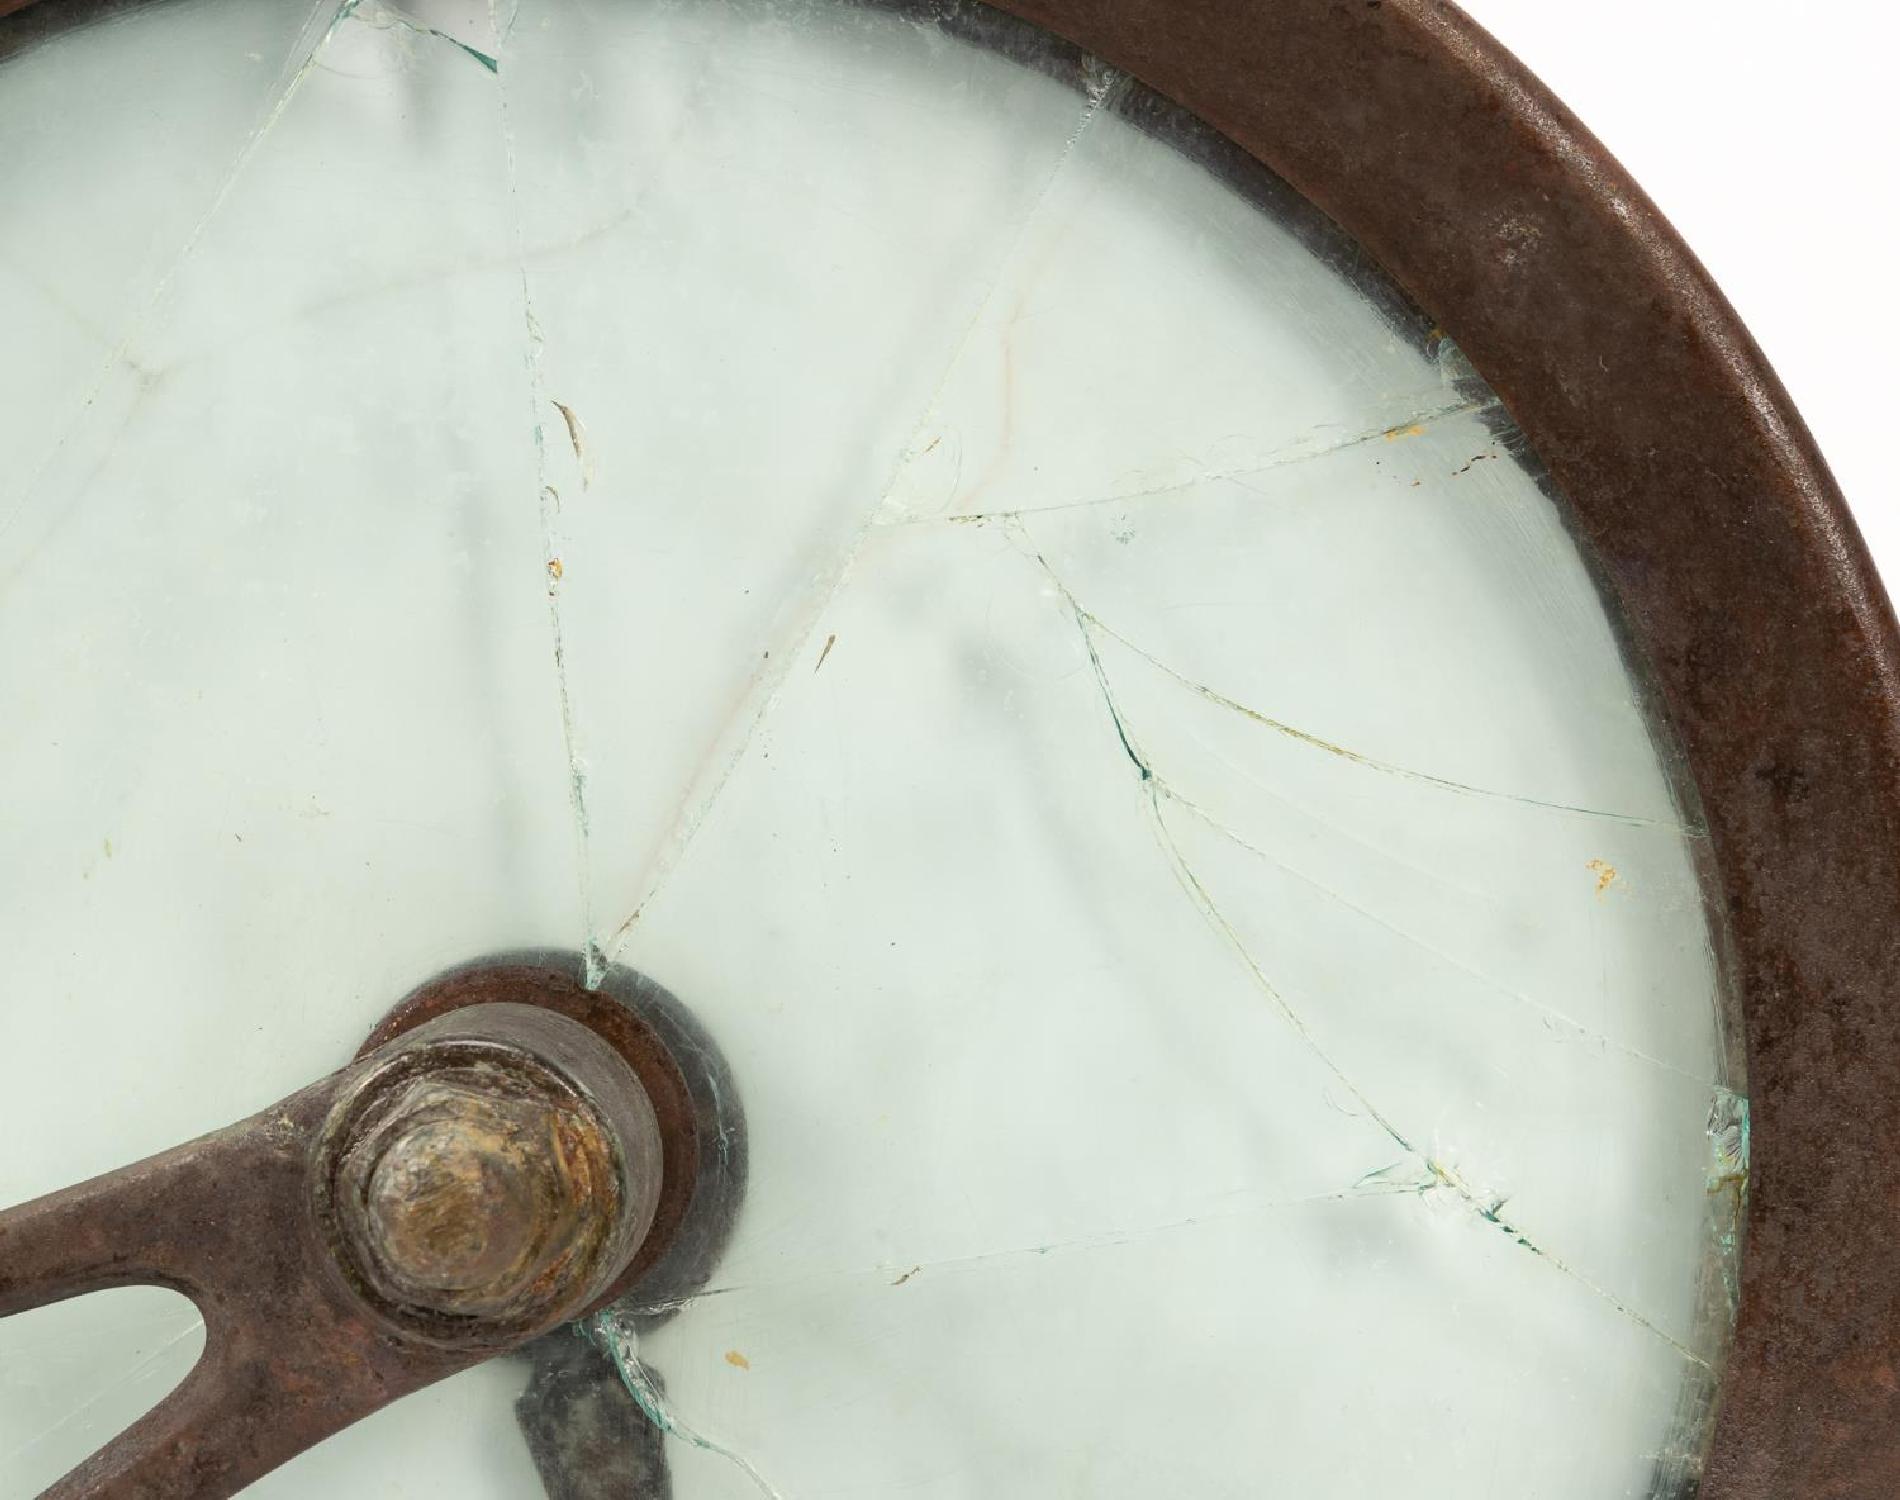 RMS CARPATHIA, SALVAGED ENGINE ORDER TELEGRAPH - Image 7 of 10